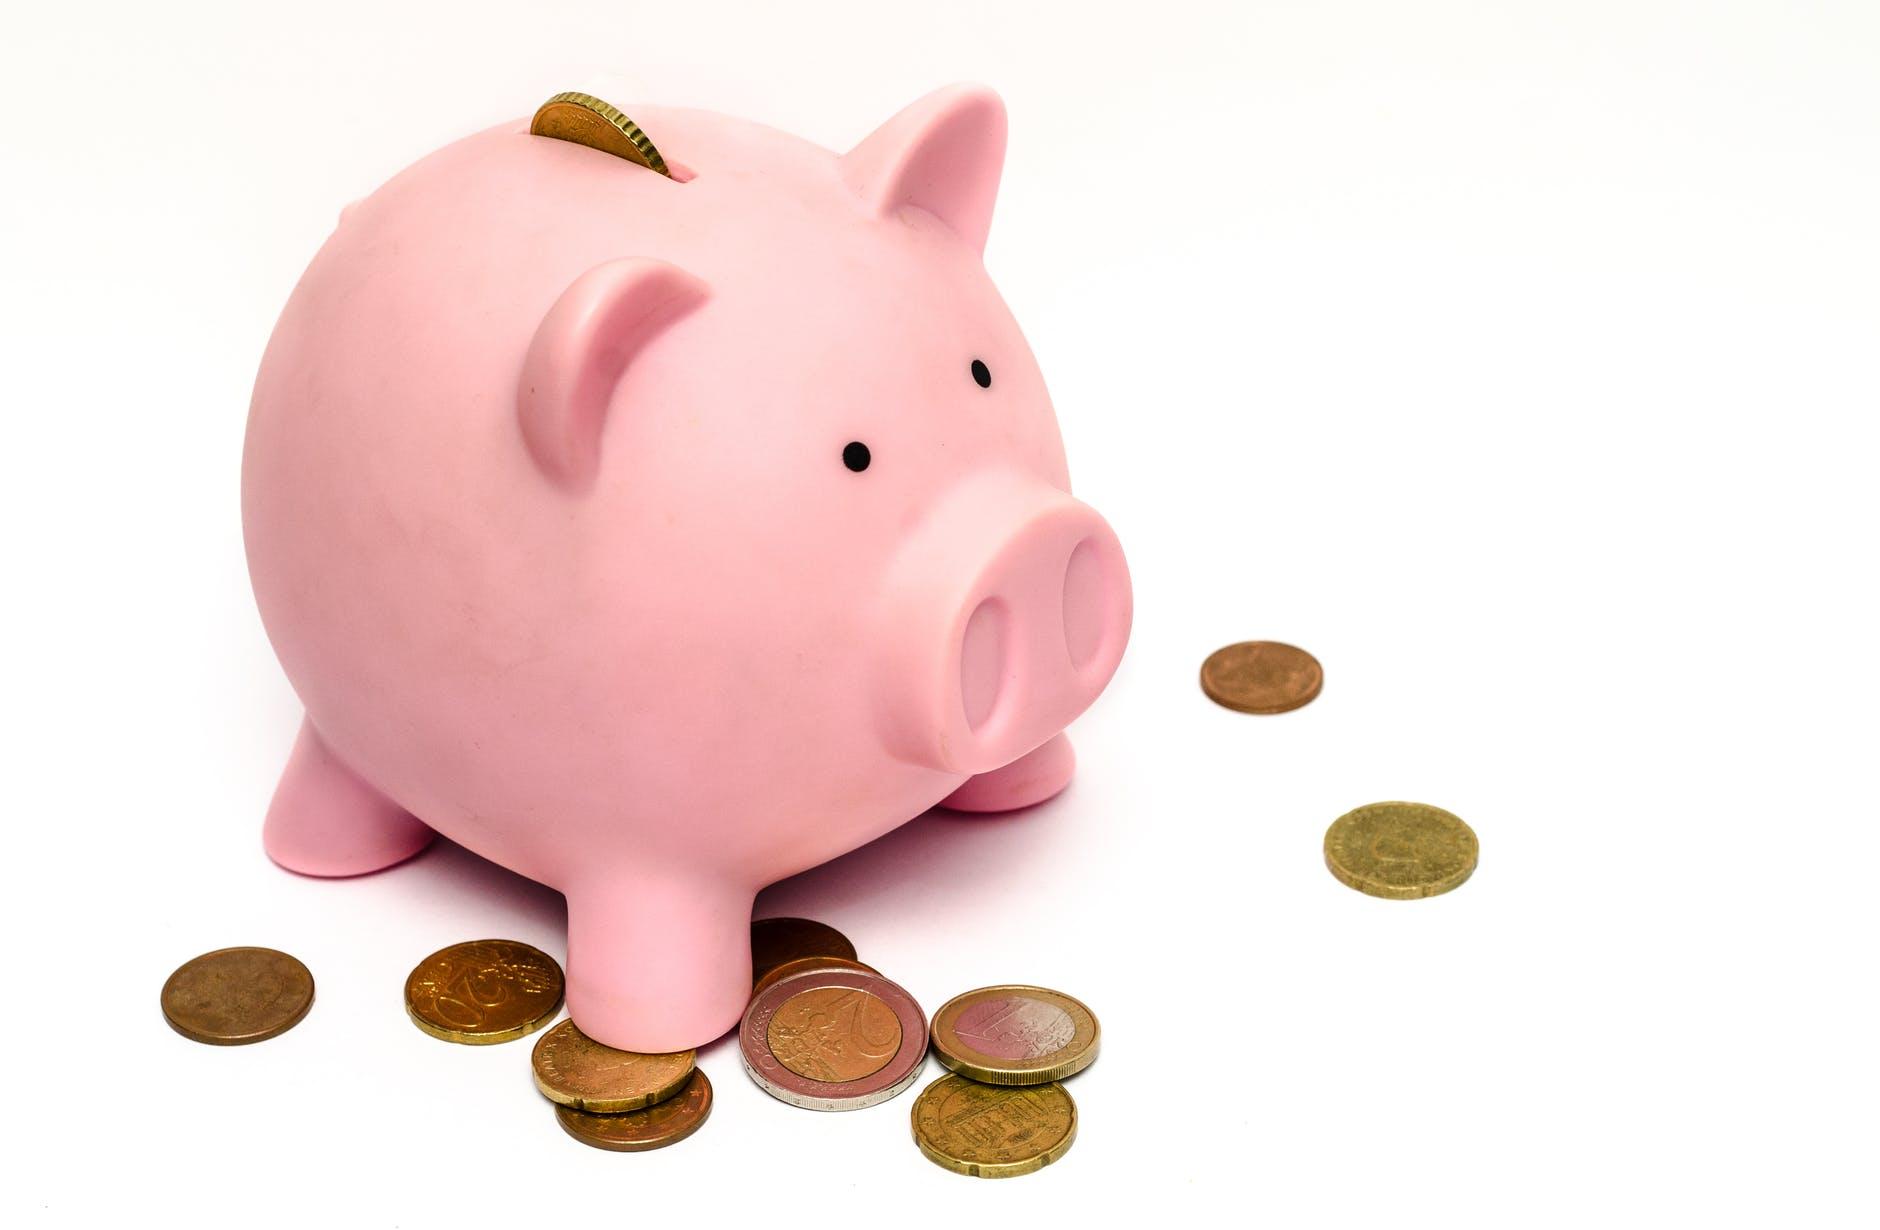 Kumon-Malaysia-Financial-Literacy_In-article-image.jpg